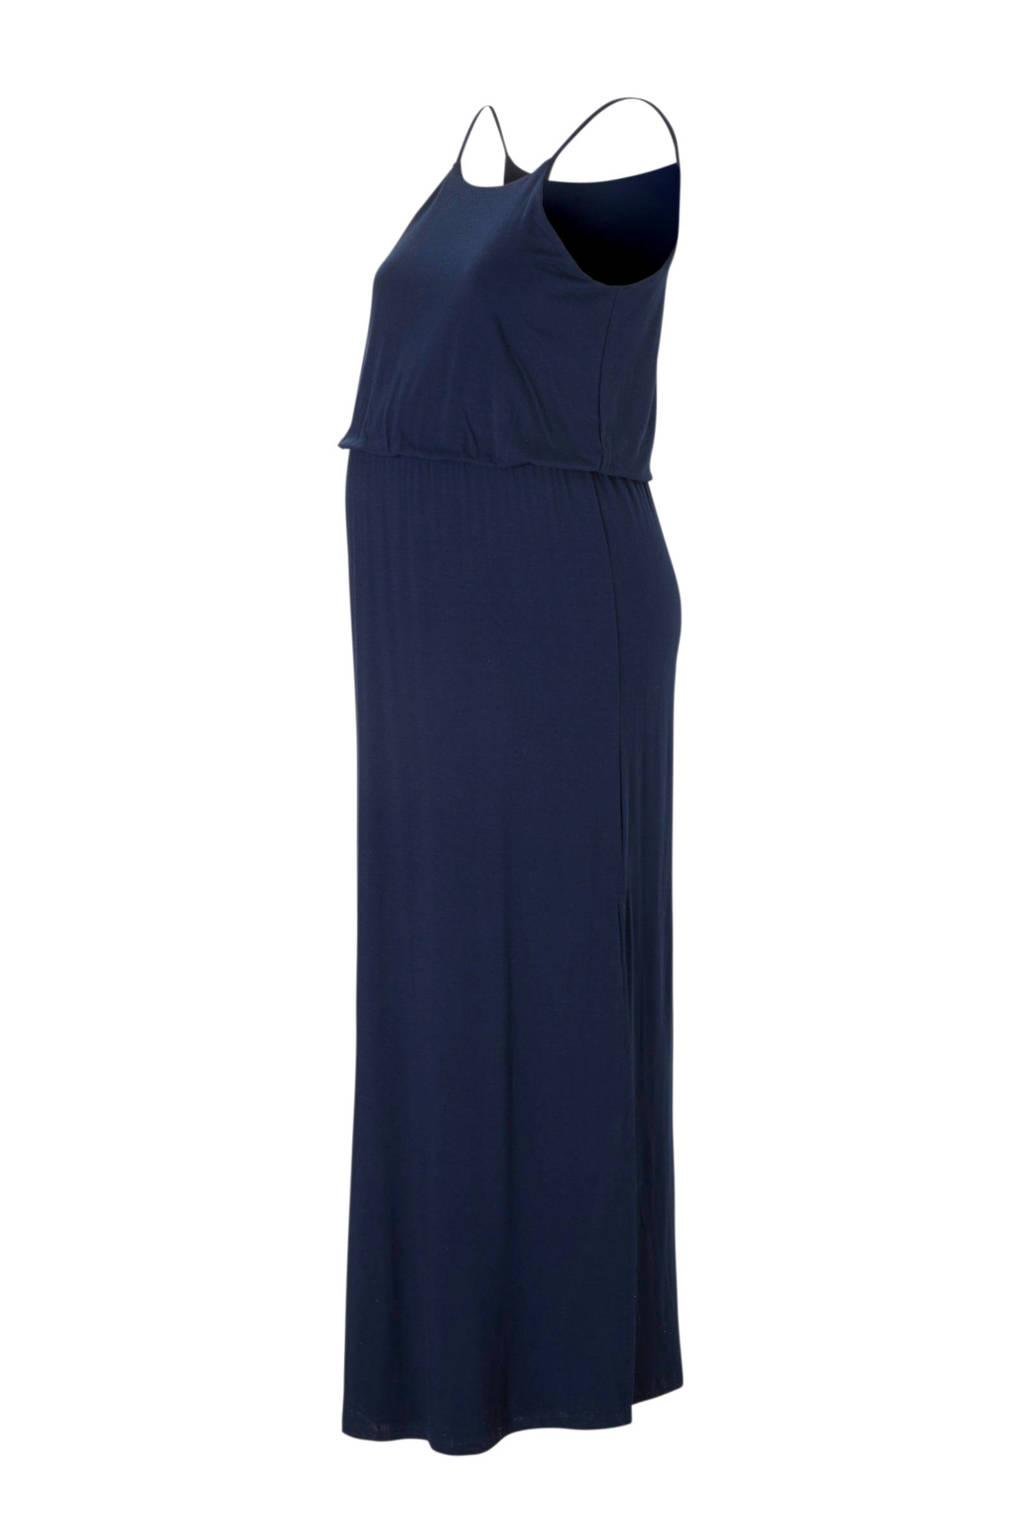 GeBe Maternity zwangerschapsjurk Ema blauw, Donkerblauw